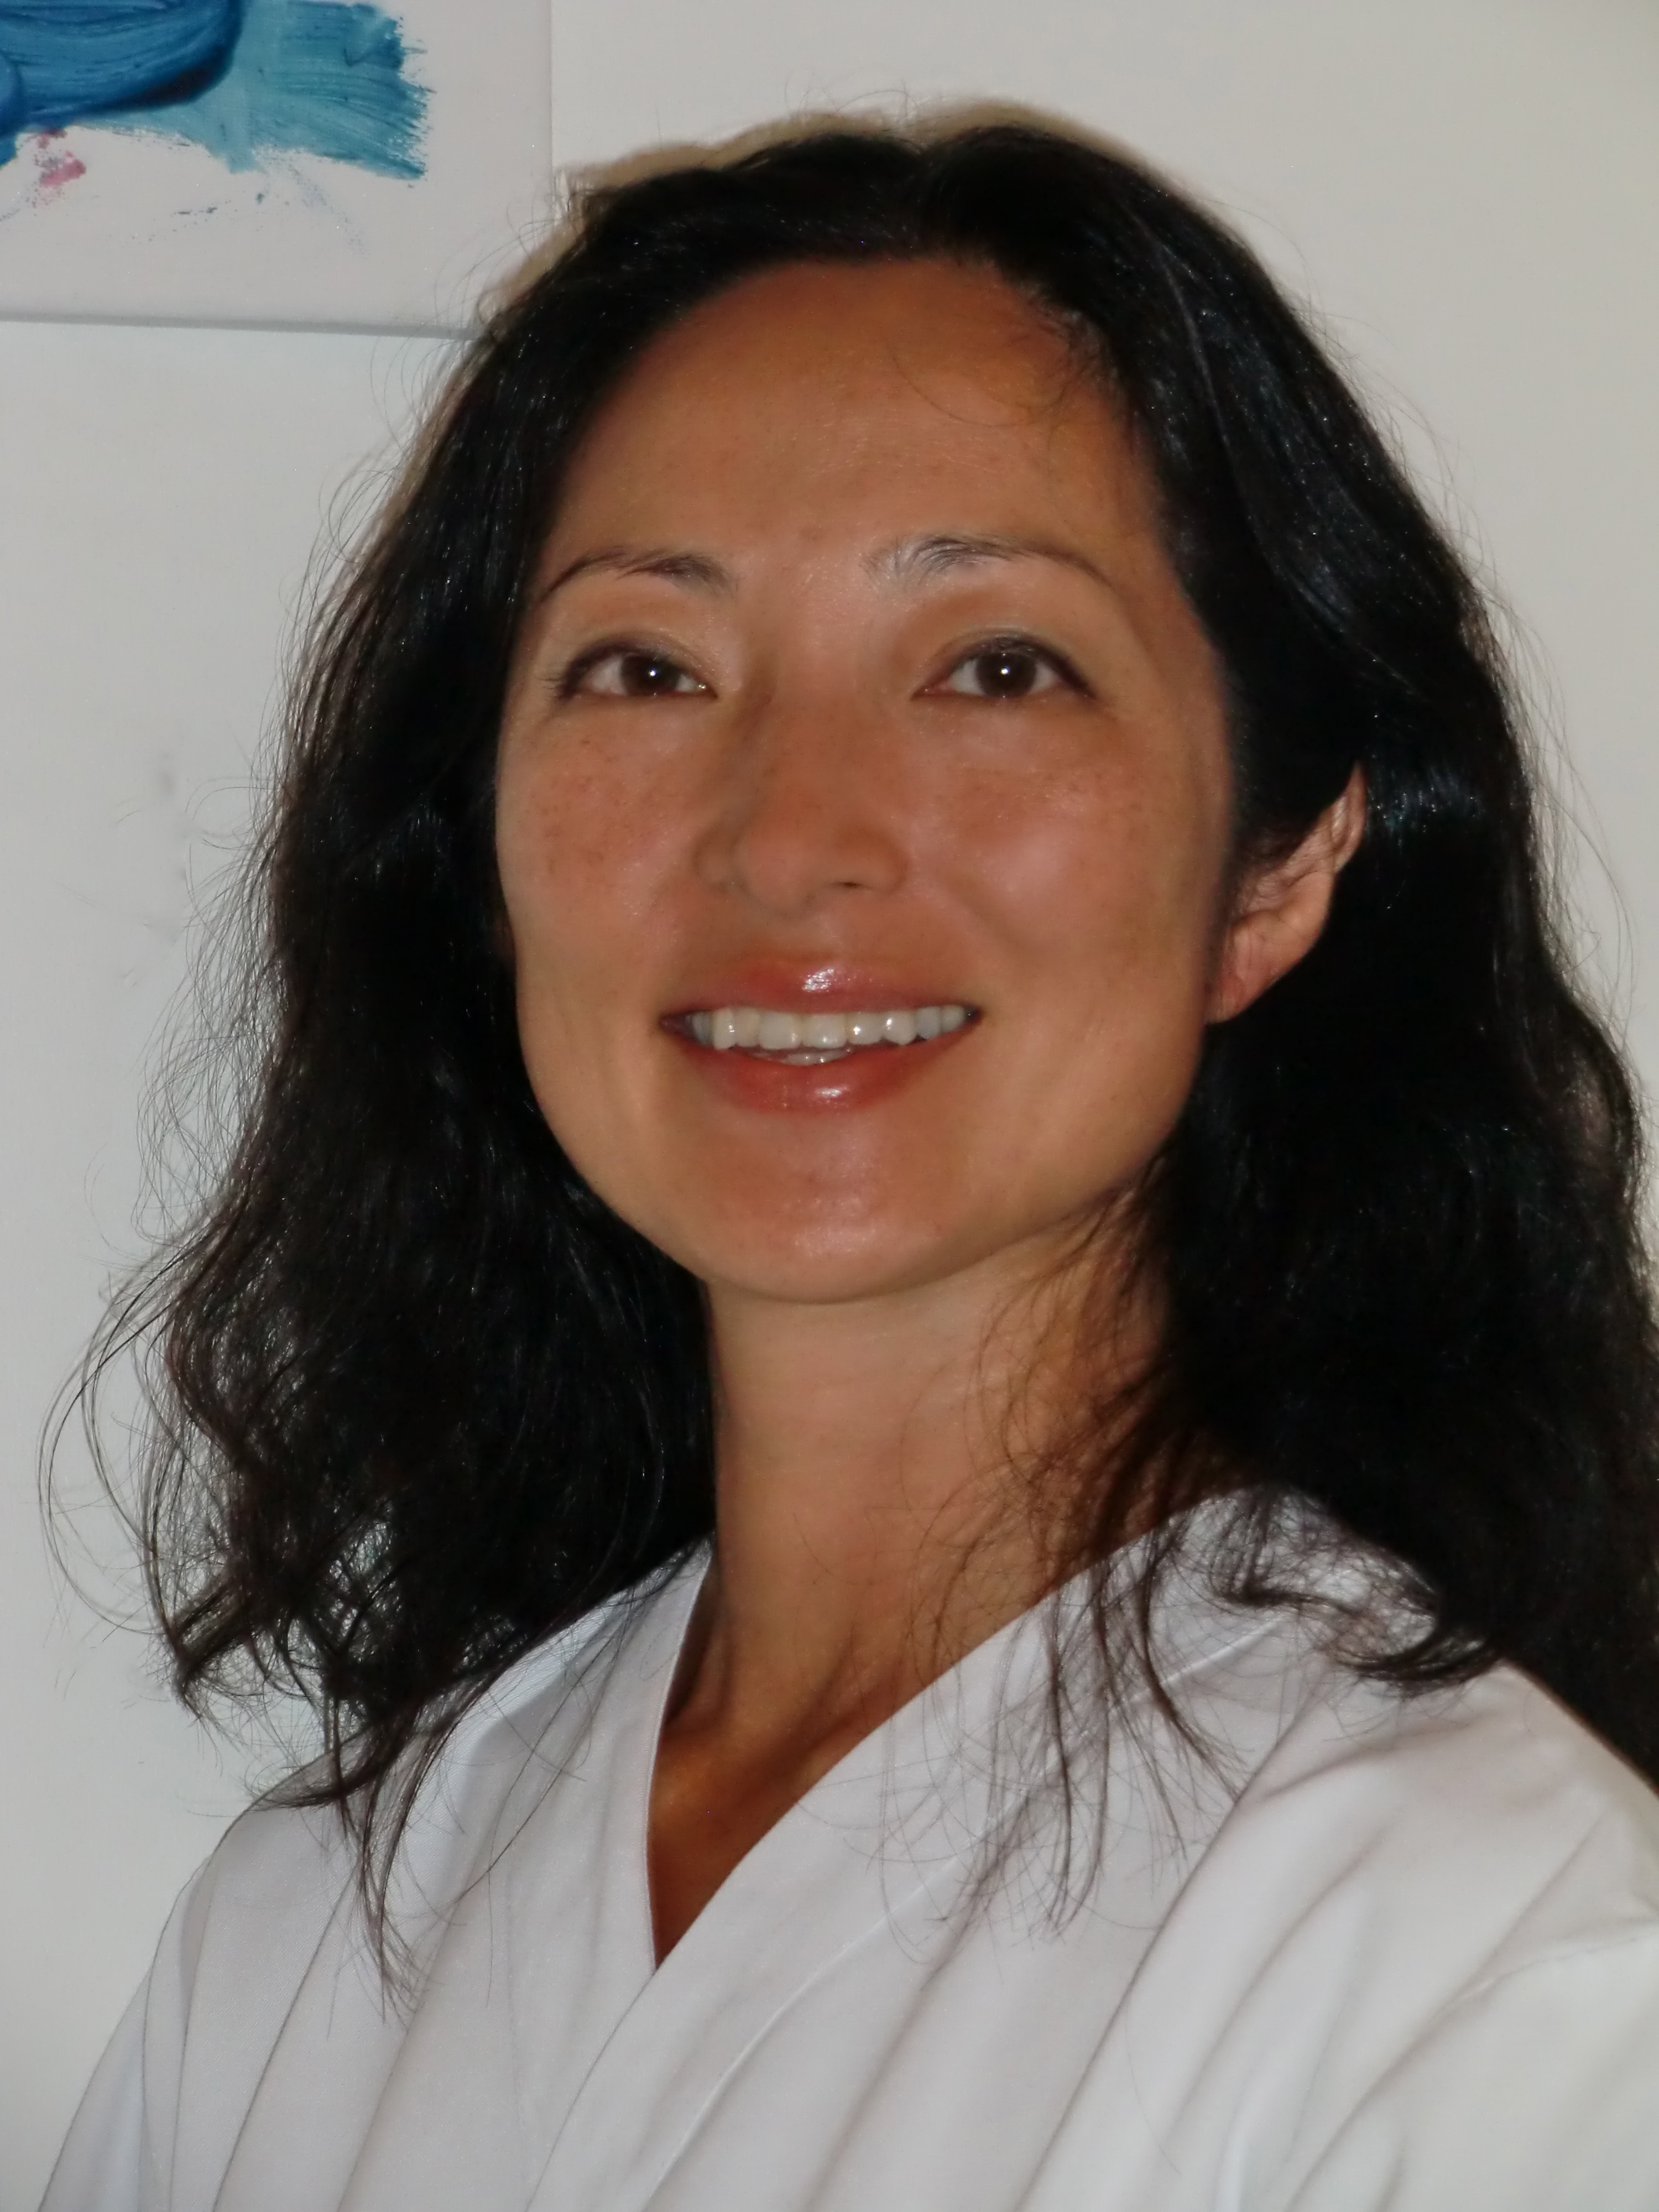 Soo Aleman om behandling mot hepatit C